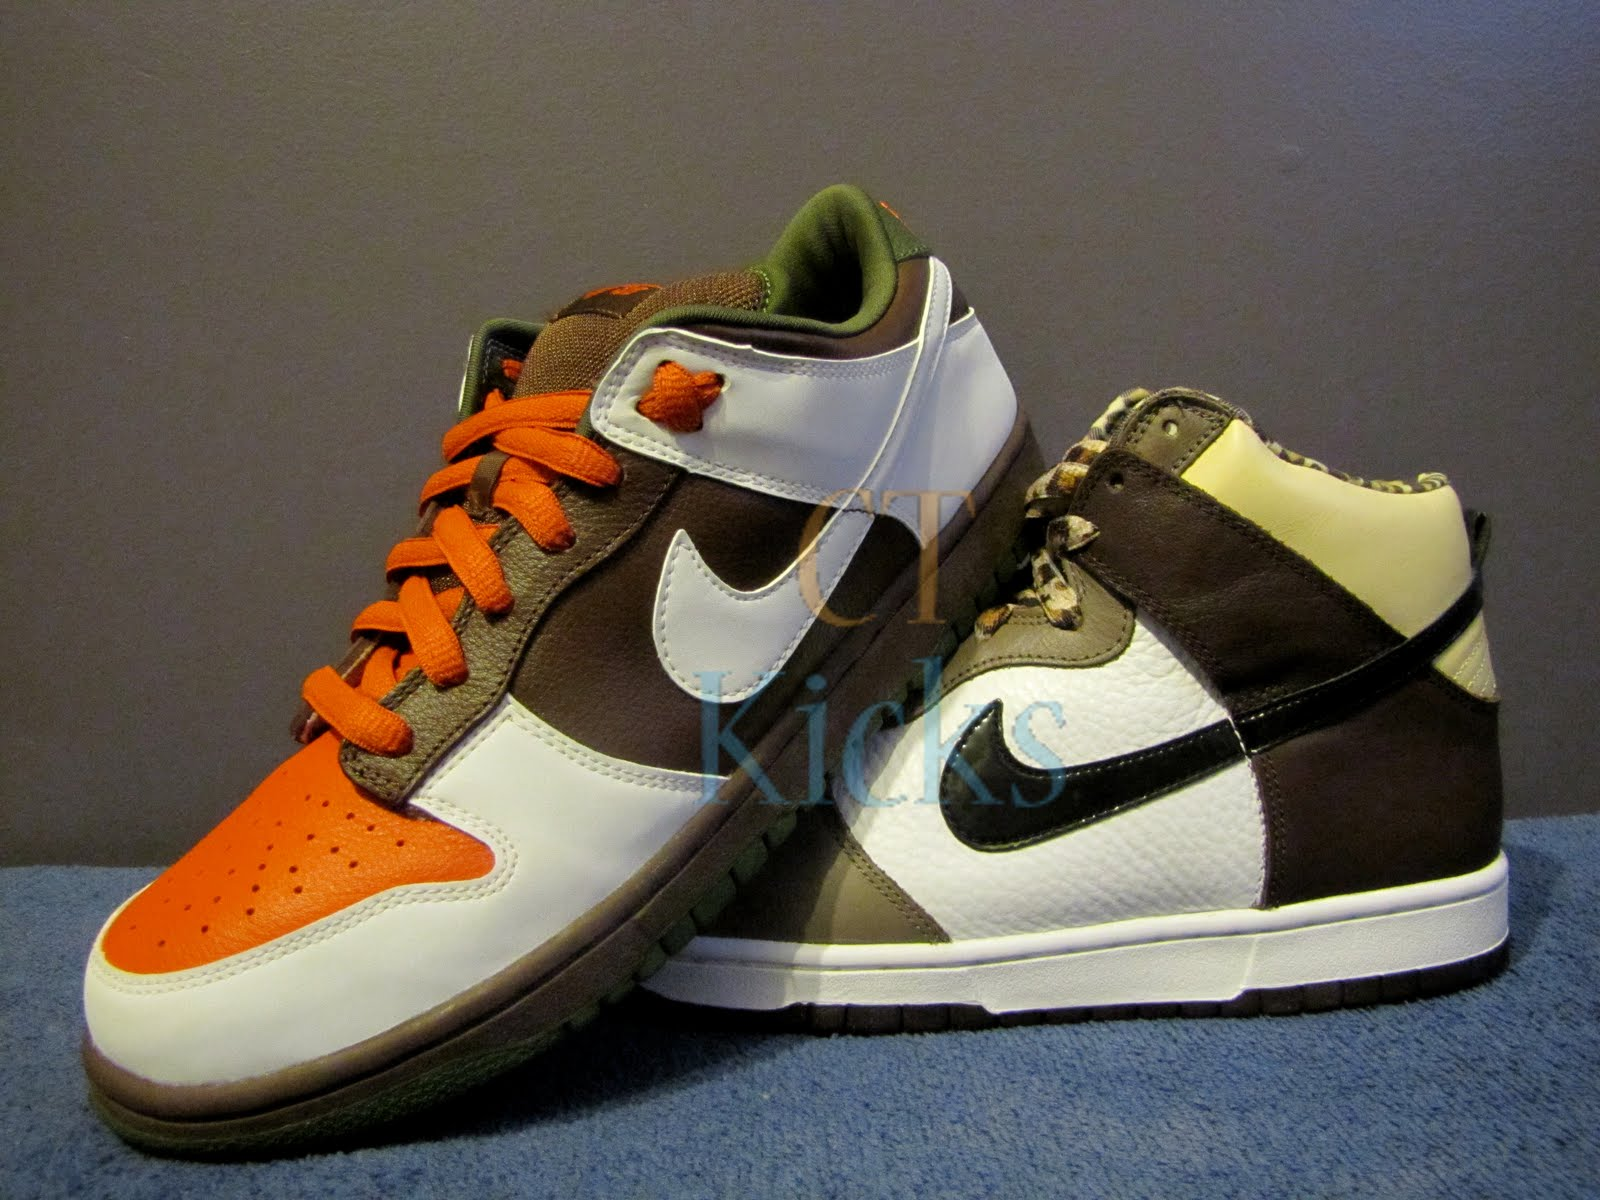 buy popular 5be48 40320 CT Kicks: #ThisorThat : Oompa Loompa or Ferris Bueller ...